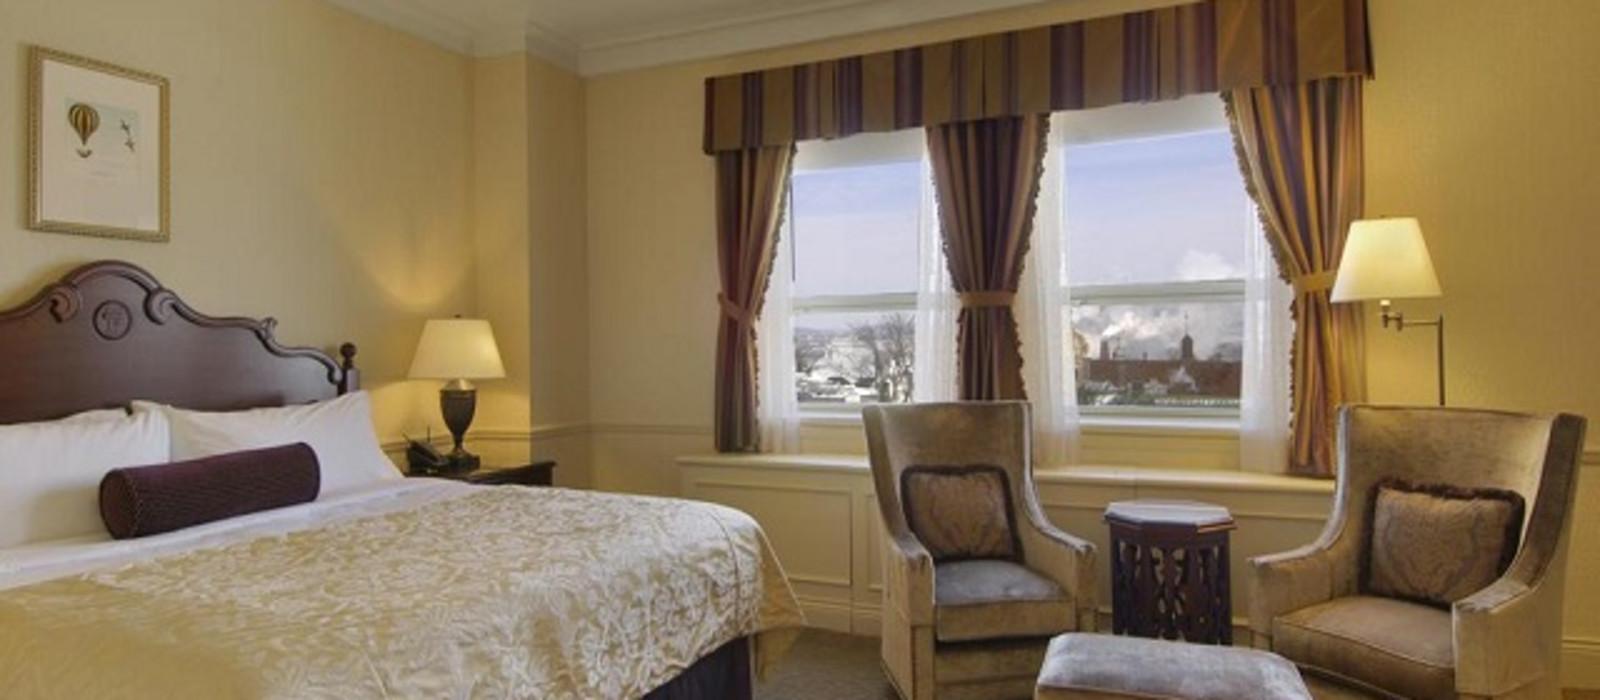 Hotel Fairmont Chateau Frontenac Canada